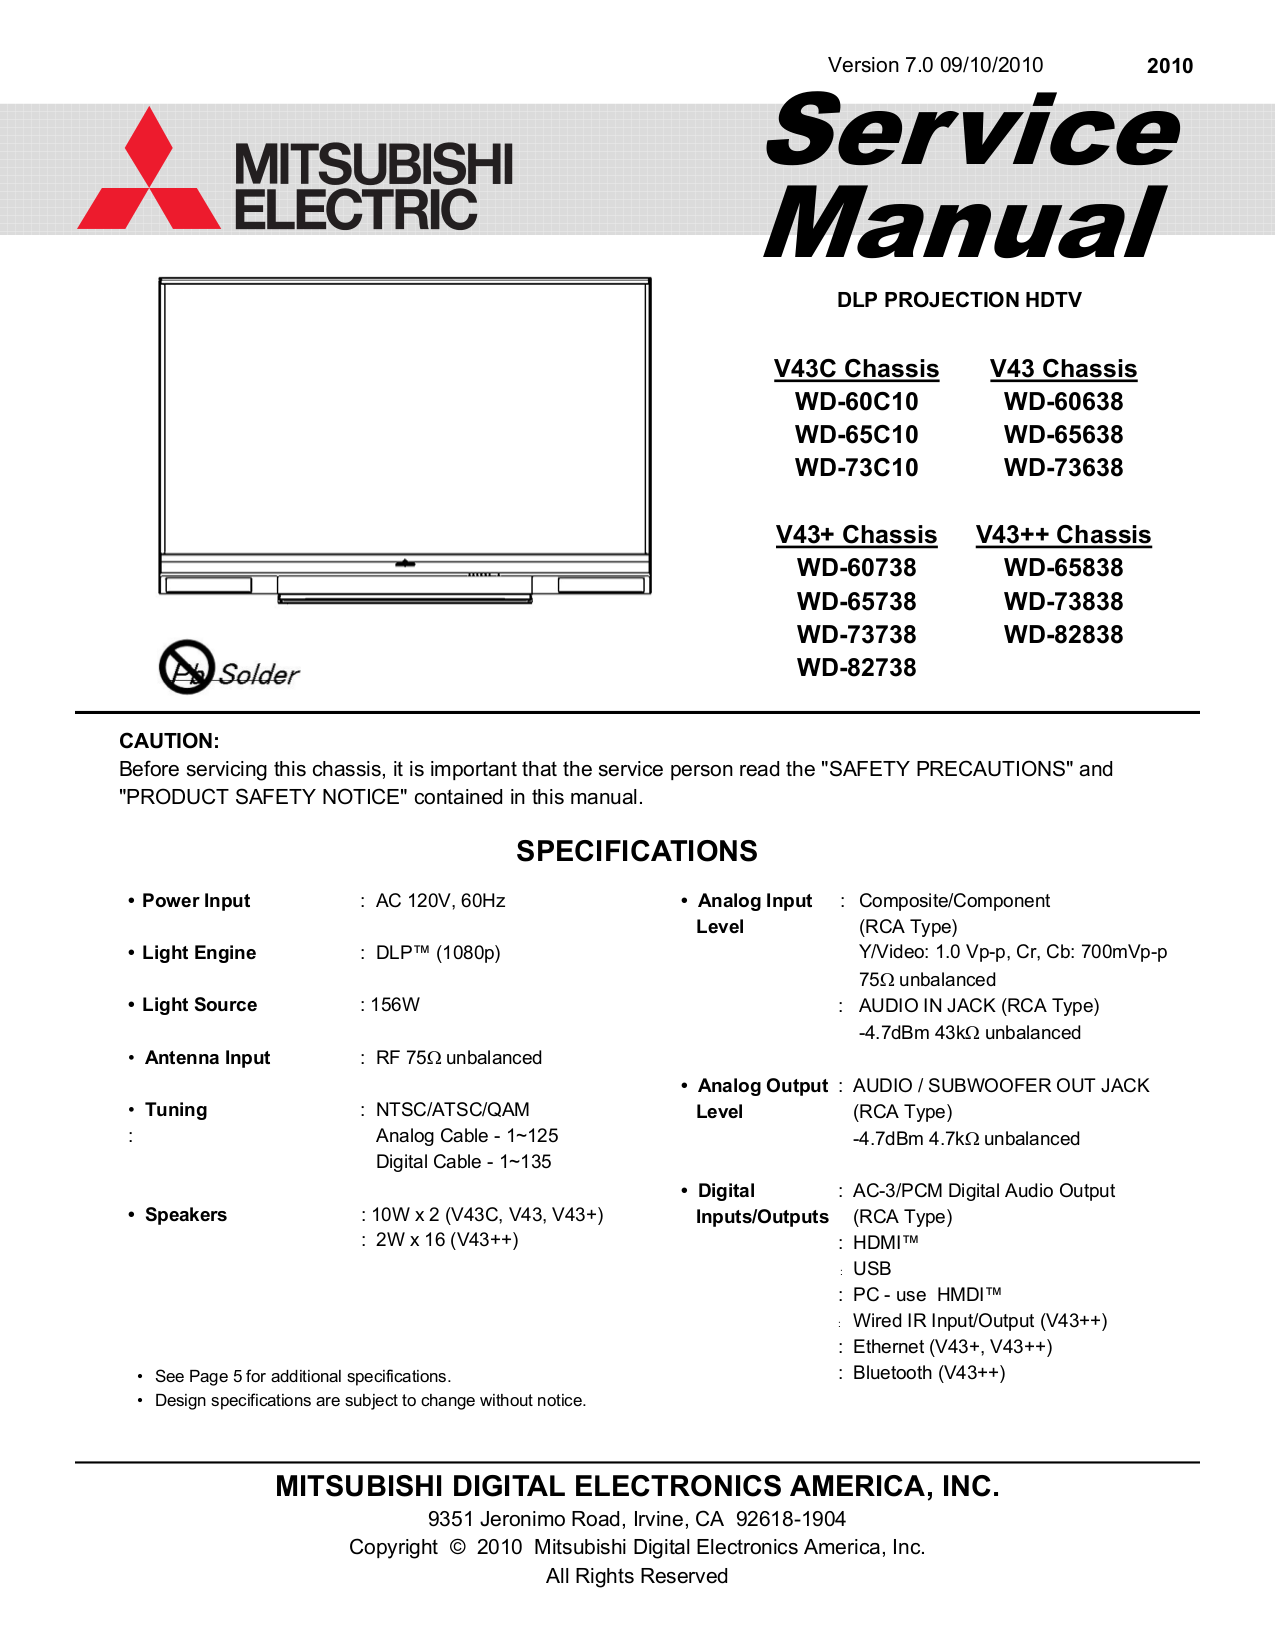 download free pdf for mitsubishi wd 82738 tv manual rh umlib com Mitsubishi 82 DLP mitsubishi wd-82738 manual